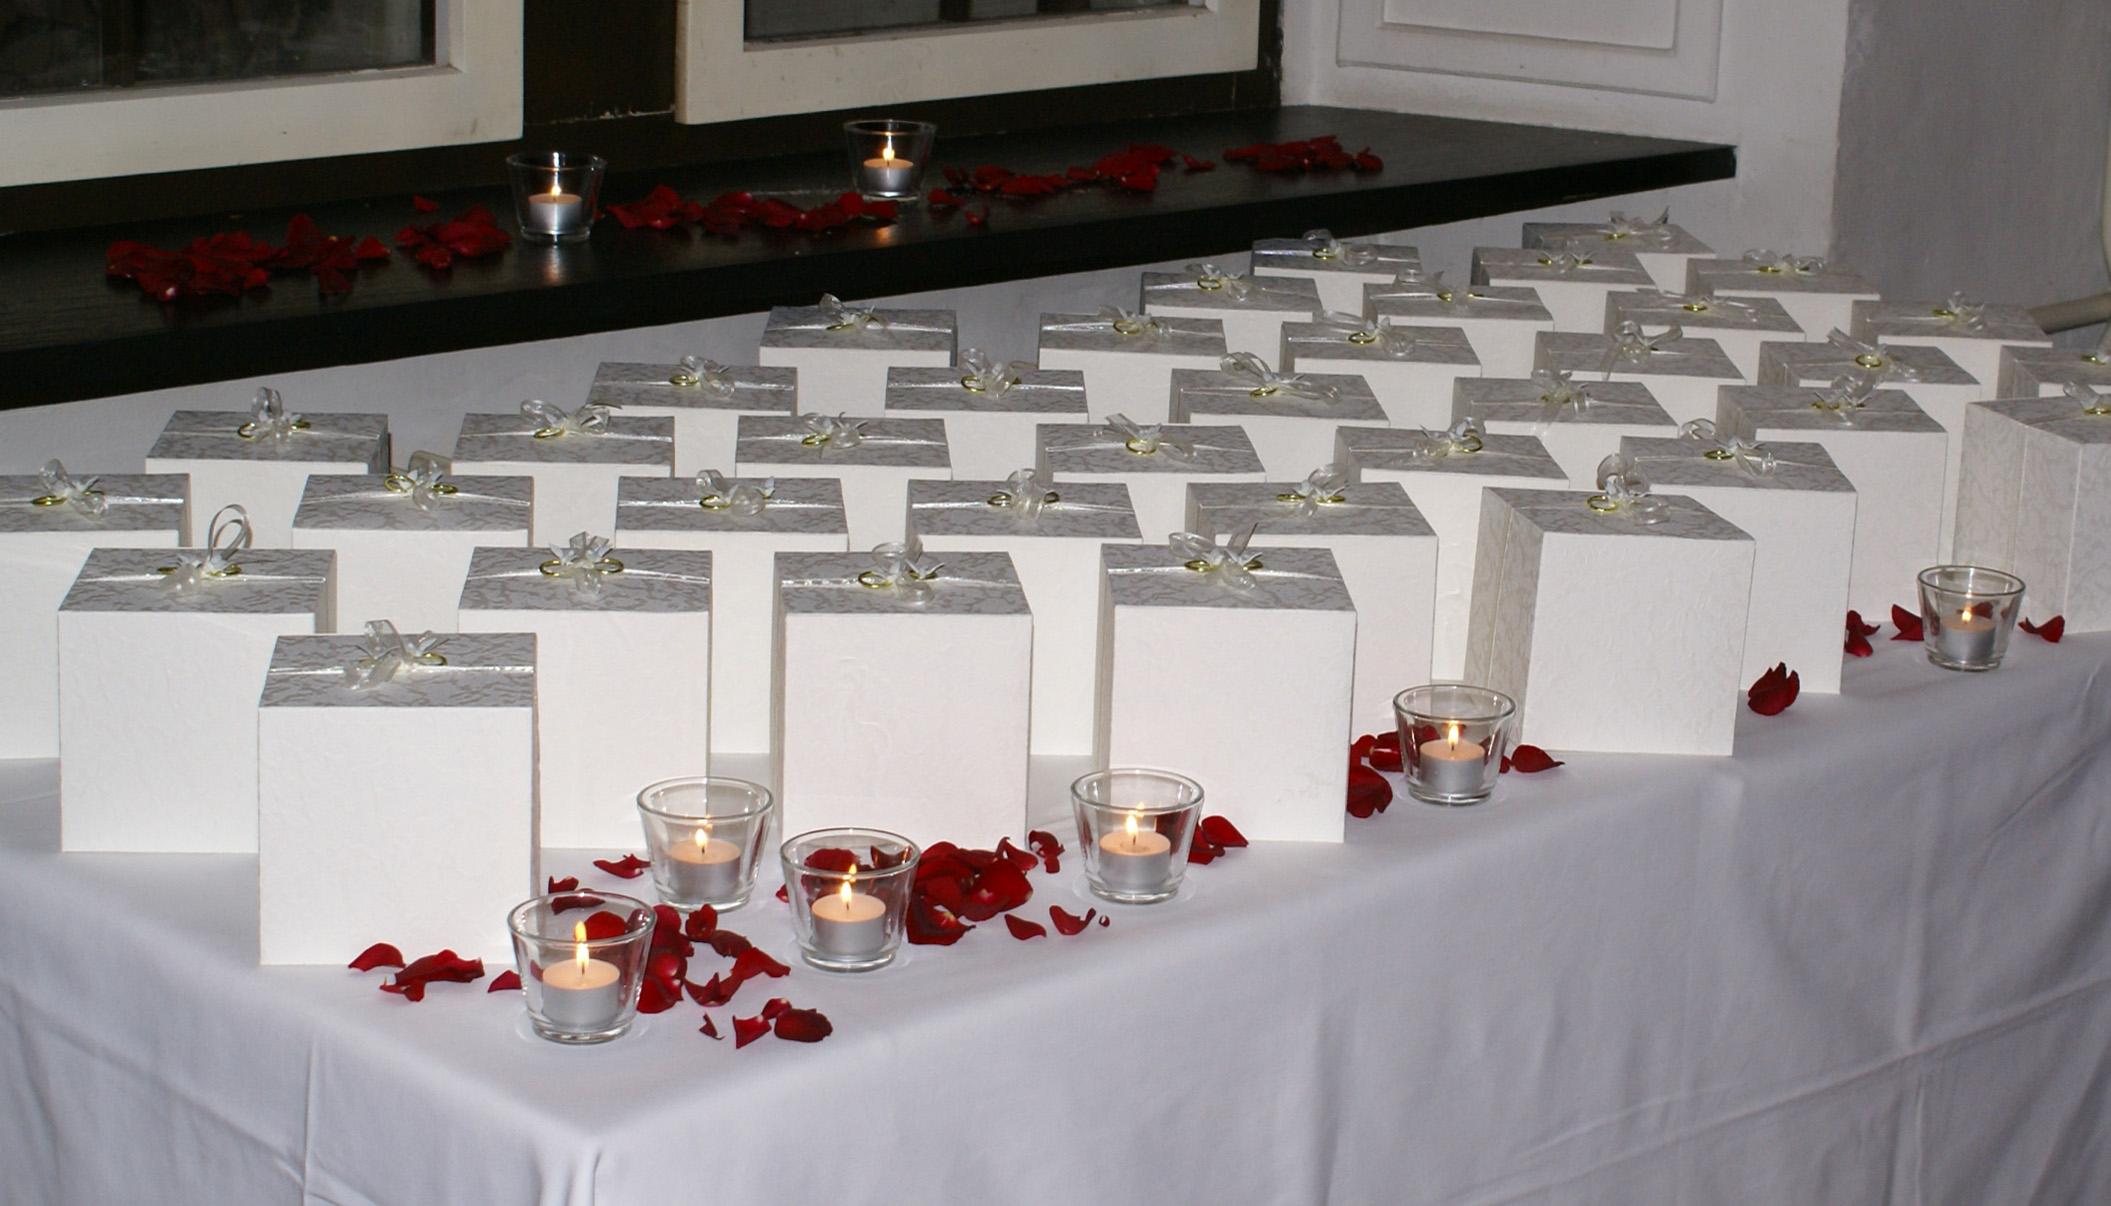 File:Bomboniera - Bonboniera - Hochzeit - Geschenke.jpg - Wikimedia ...